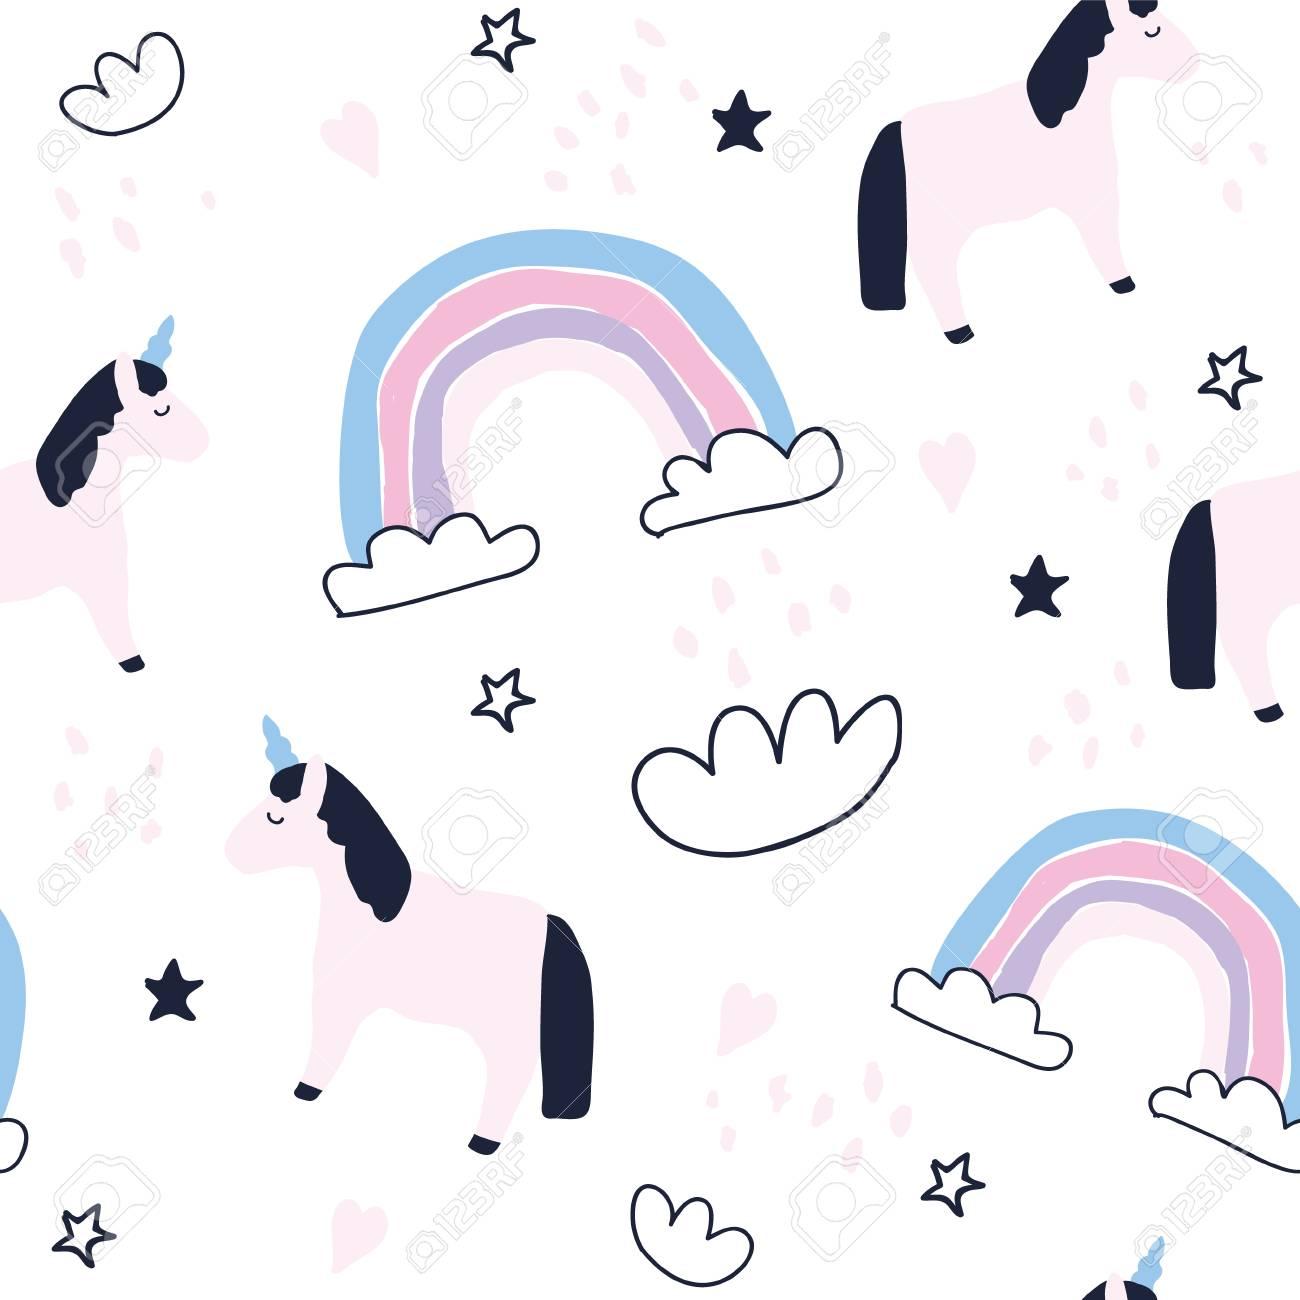 Cute unicorns and rainbows seamless pattern. Baby unicorn wallpaper. Newborn baby textile design.